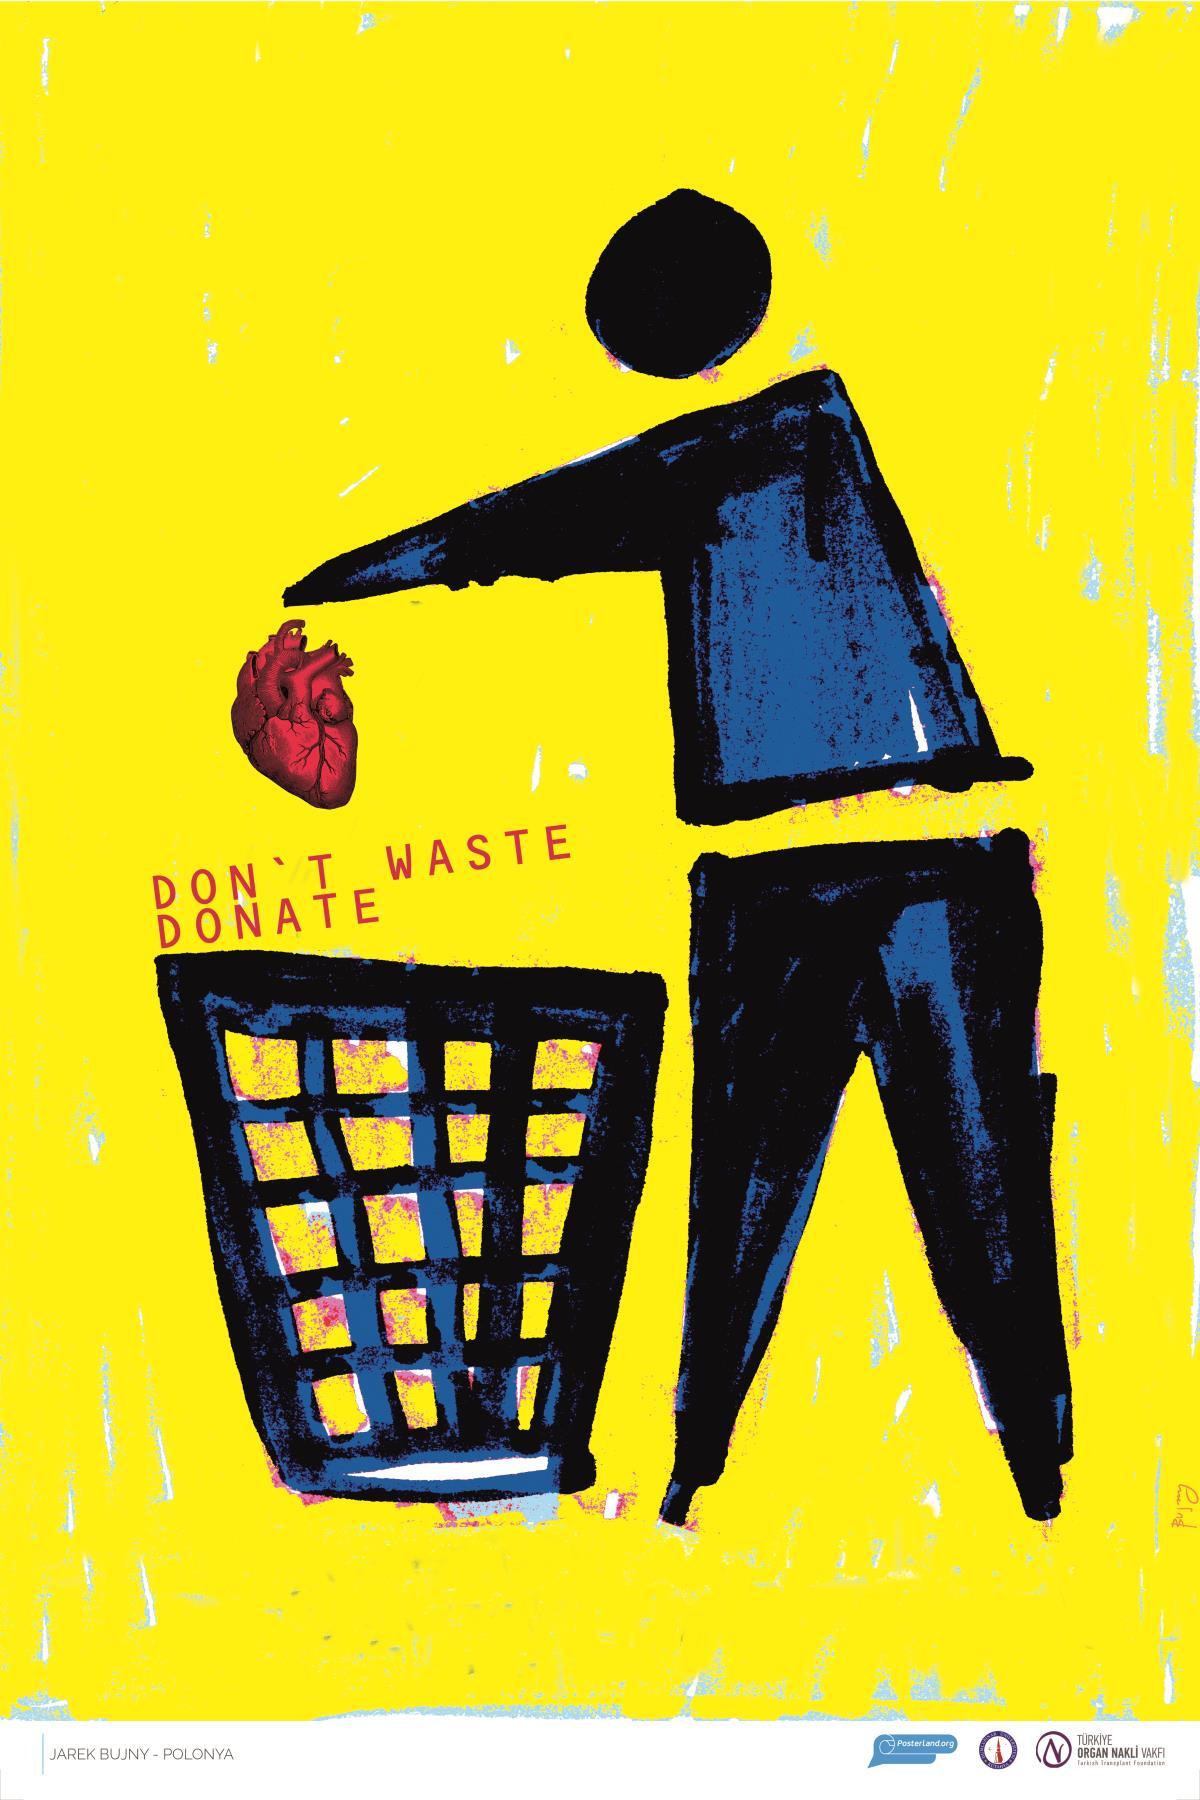 poster design donate organ kids painting